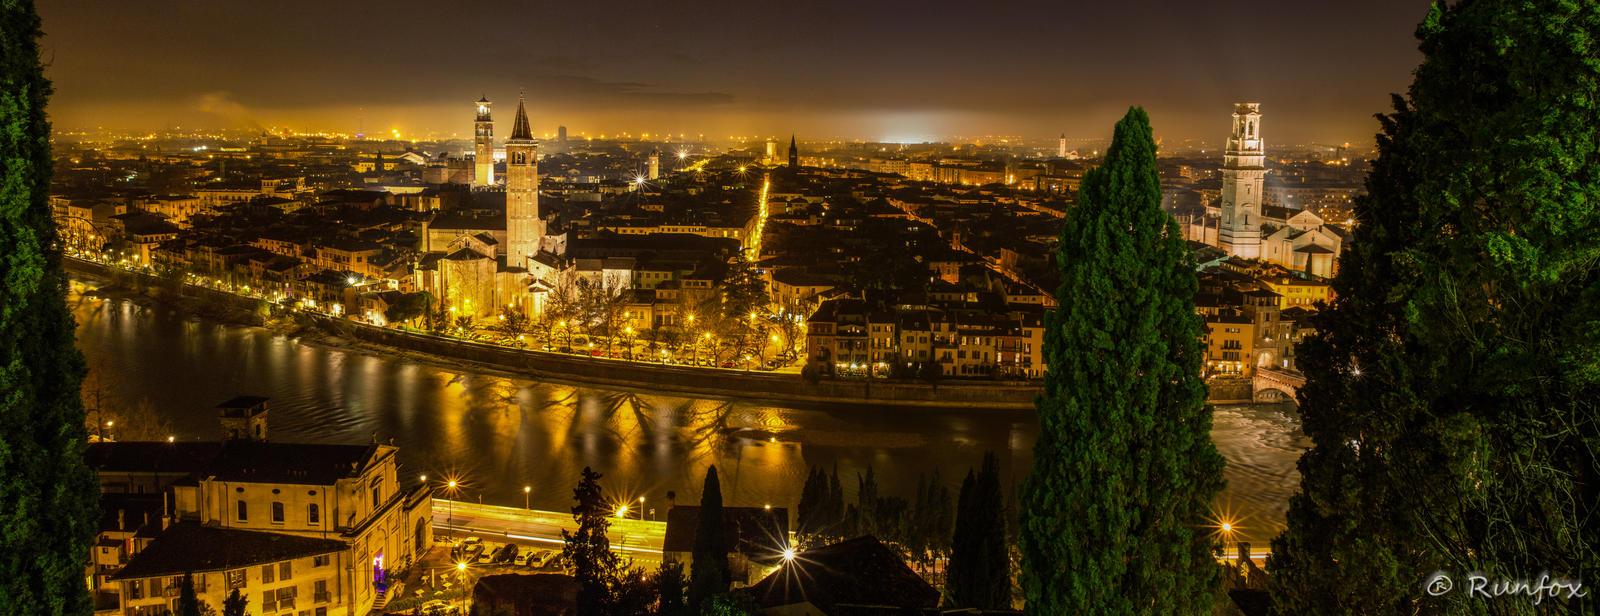 Verona at night by Runfox